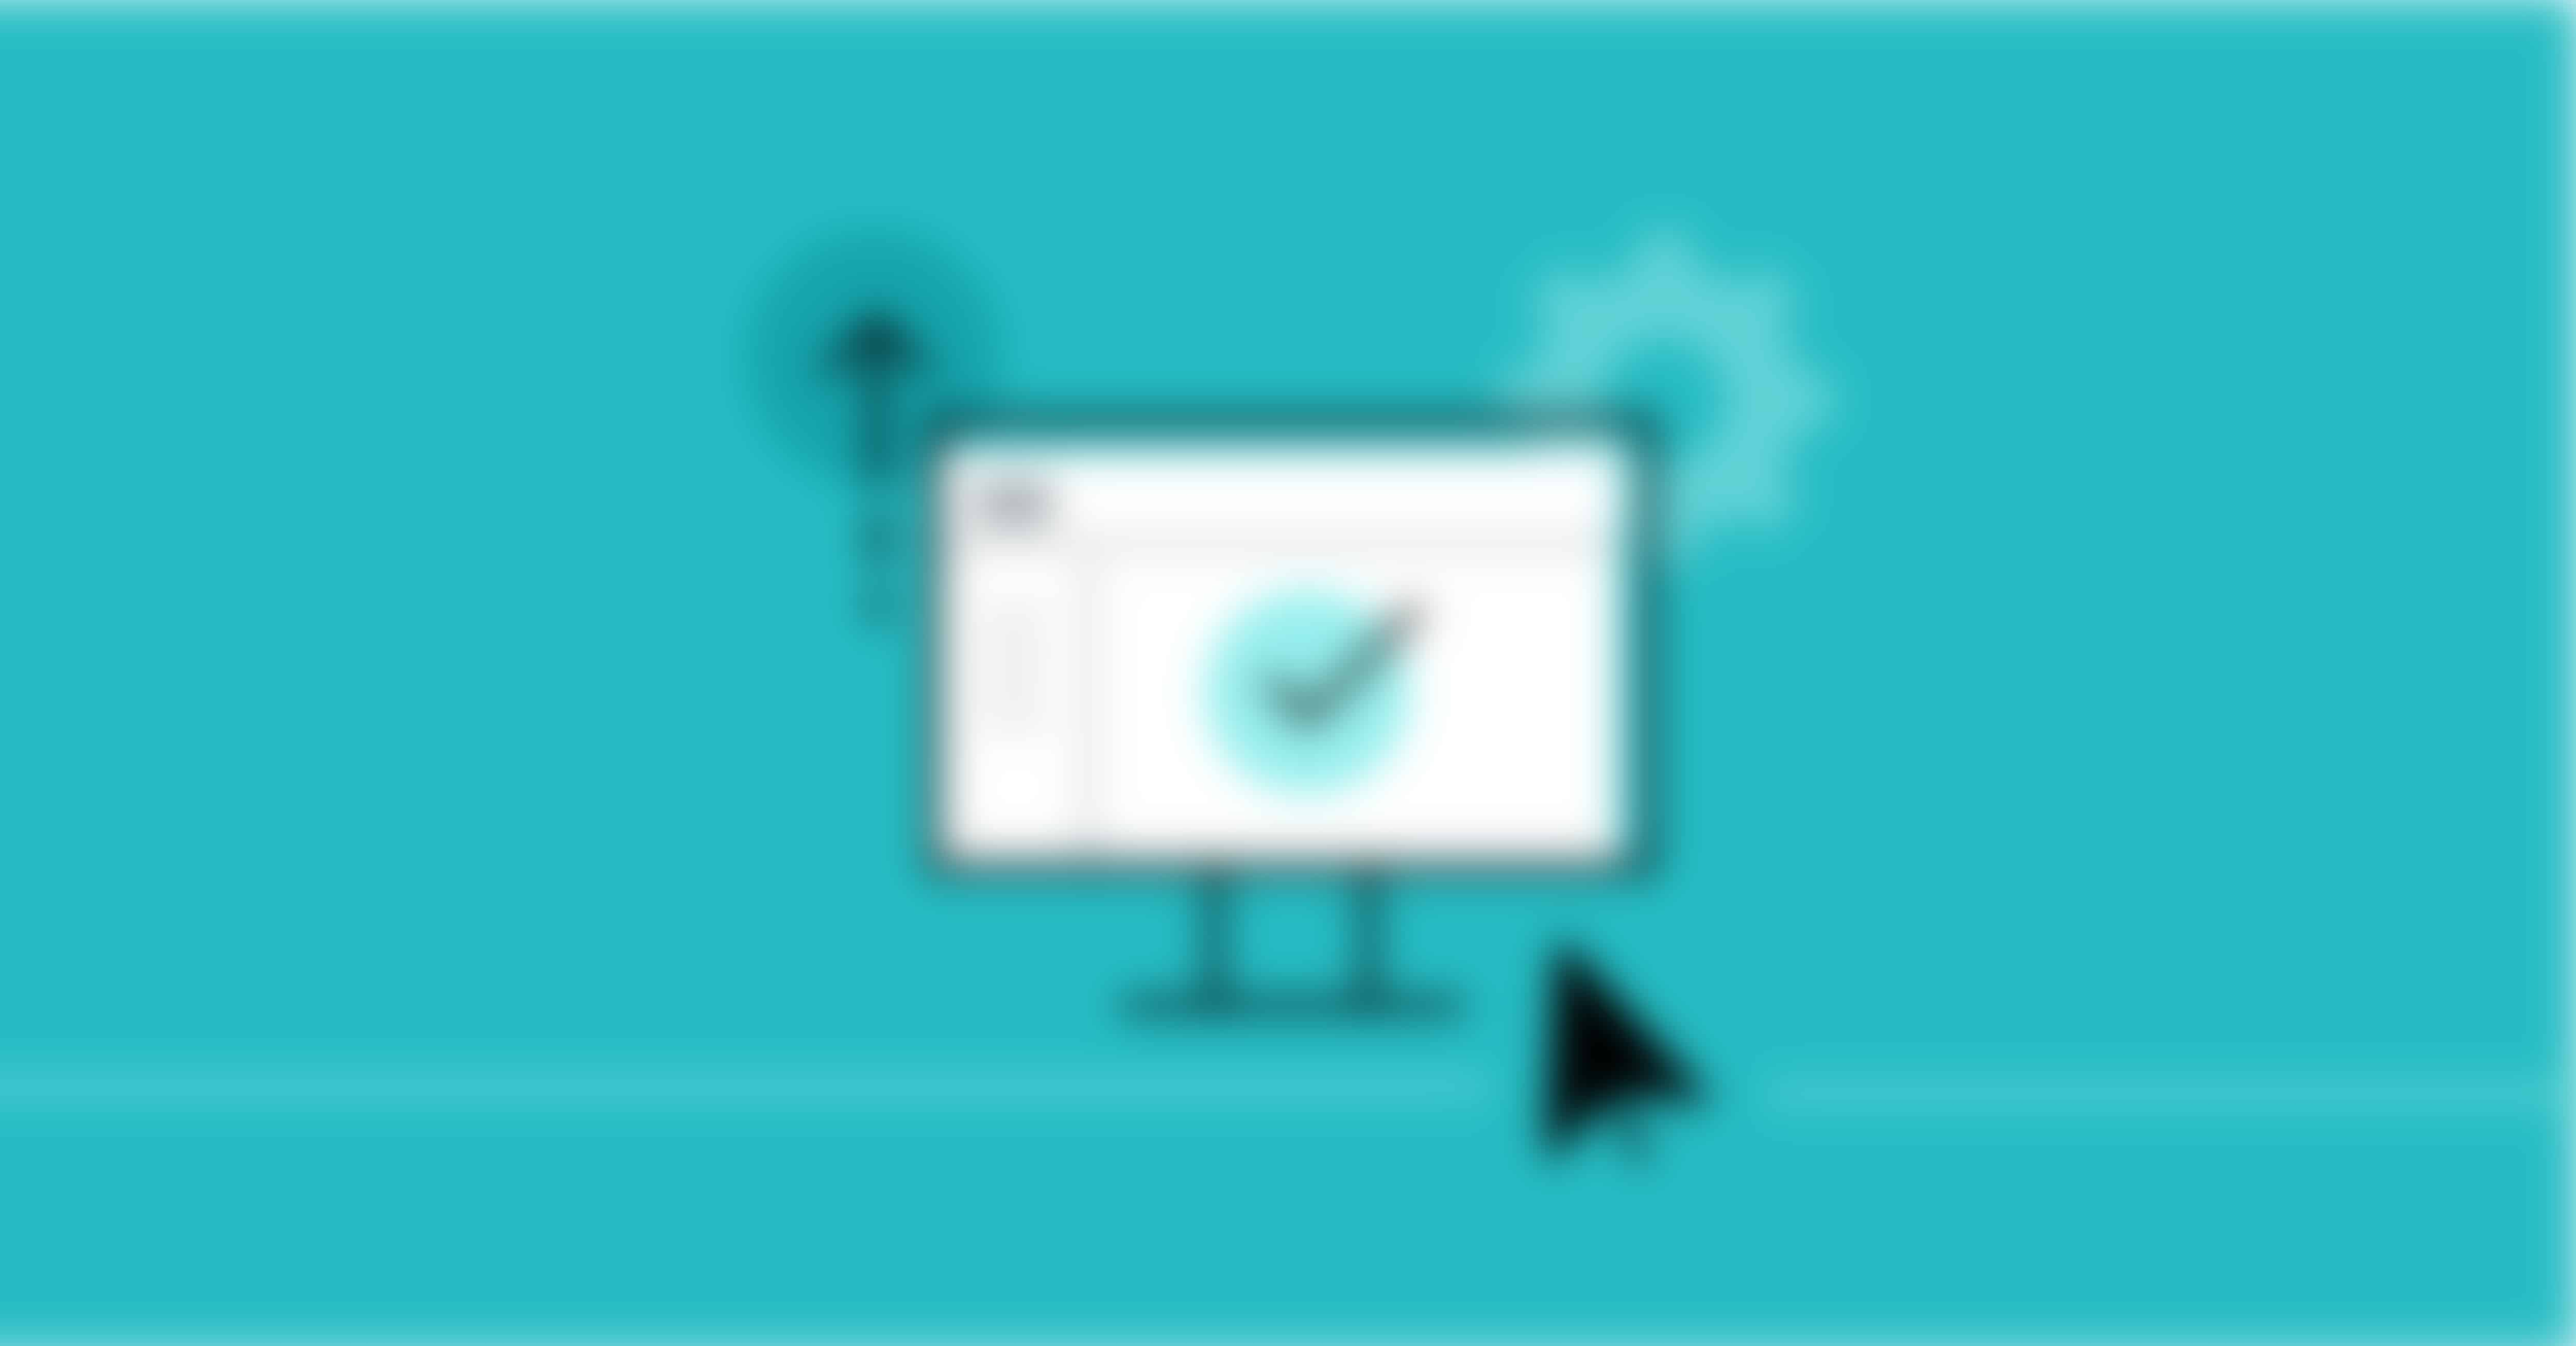 Illustration of improved technology